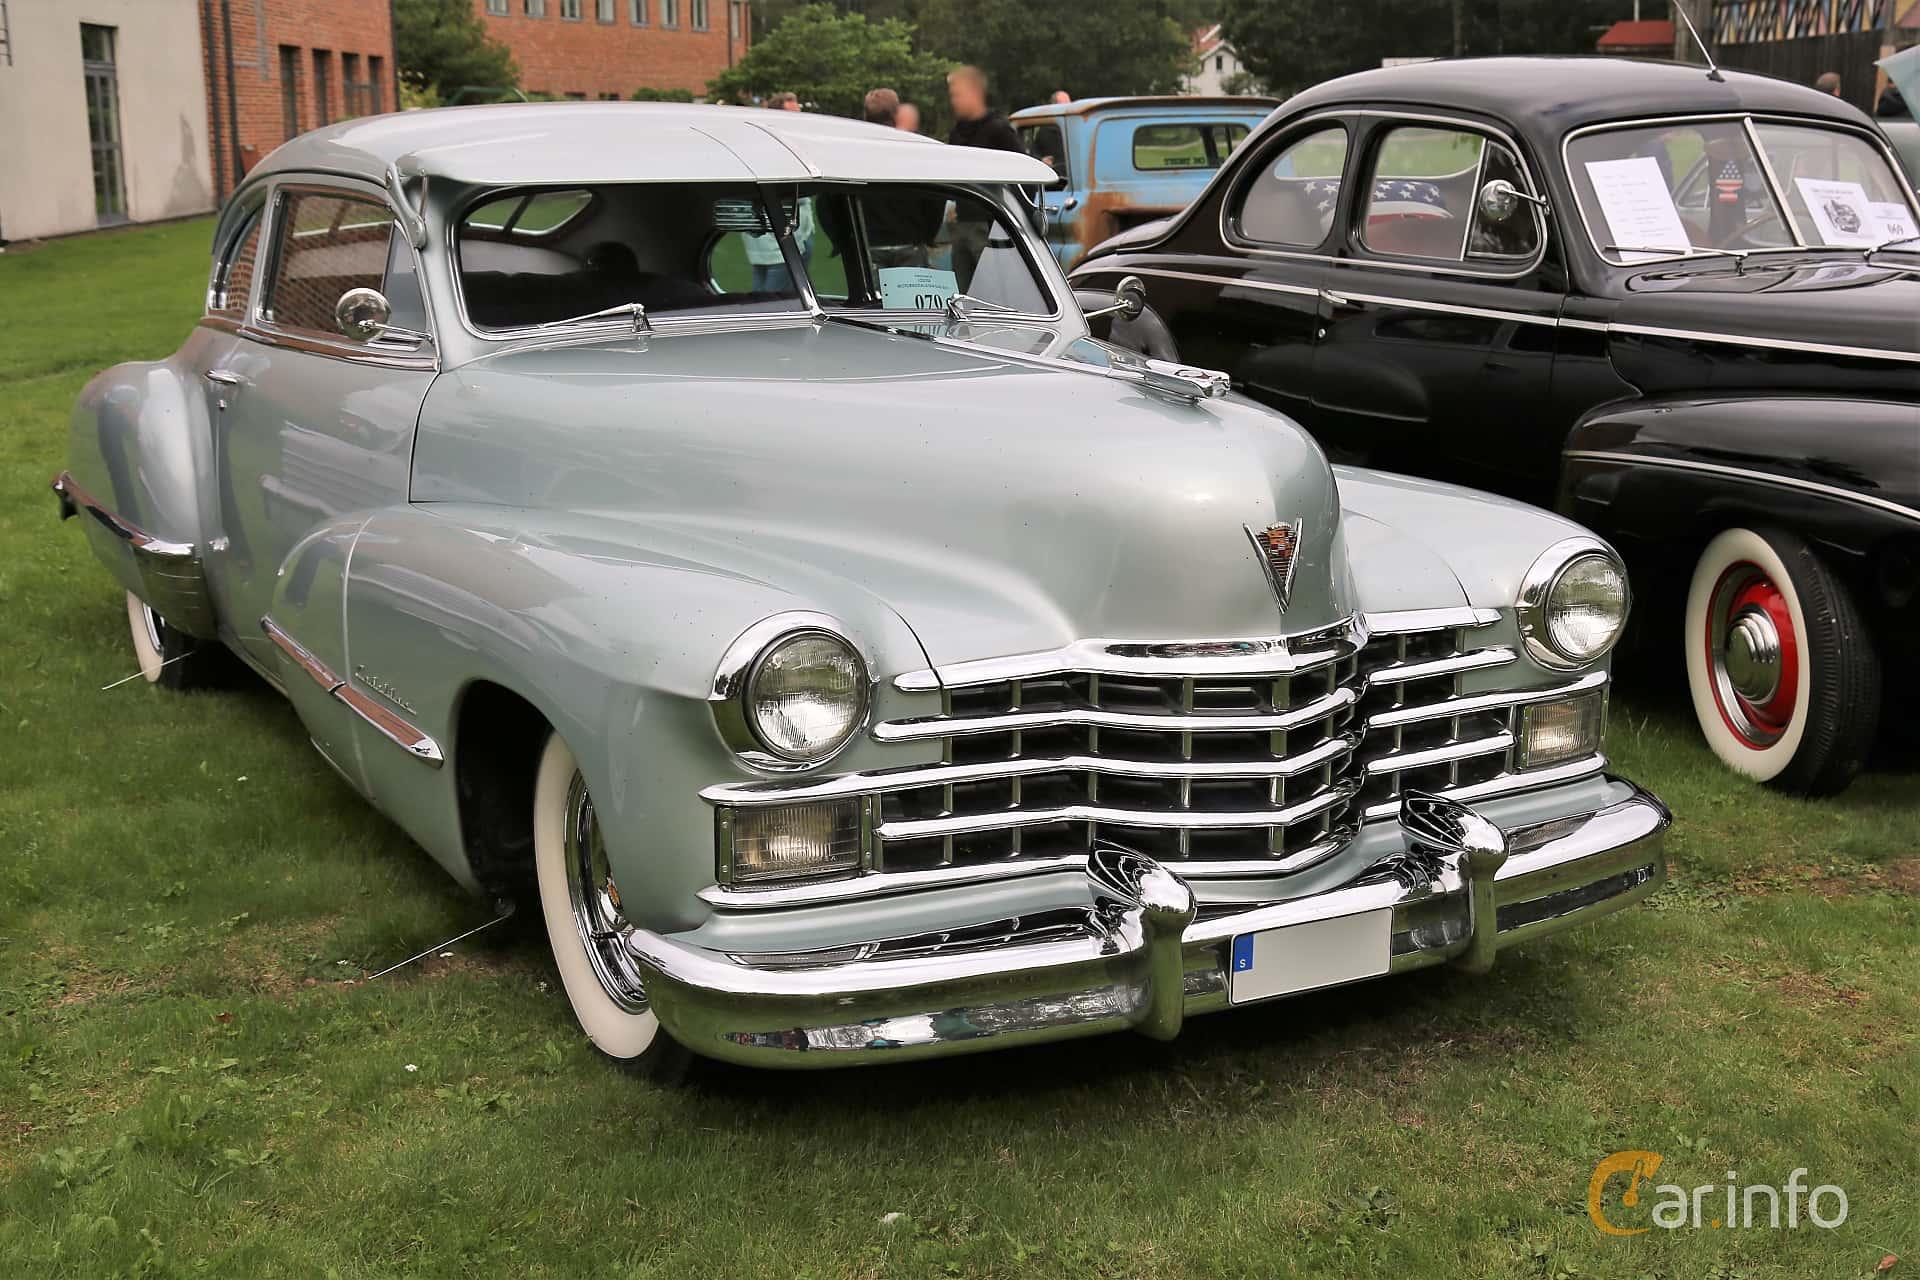 Cadillac Sixty-Two Club Coupé 5.7 V8 Hydra-Matic, 152hp, 1947 at Lödöse motornostalgiska dag 2019